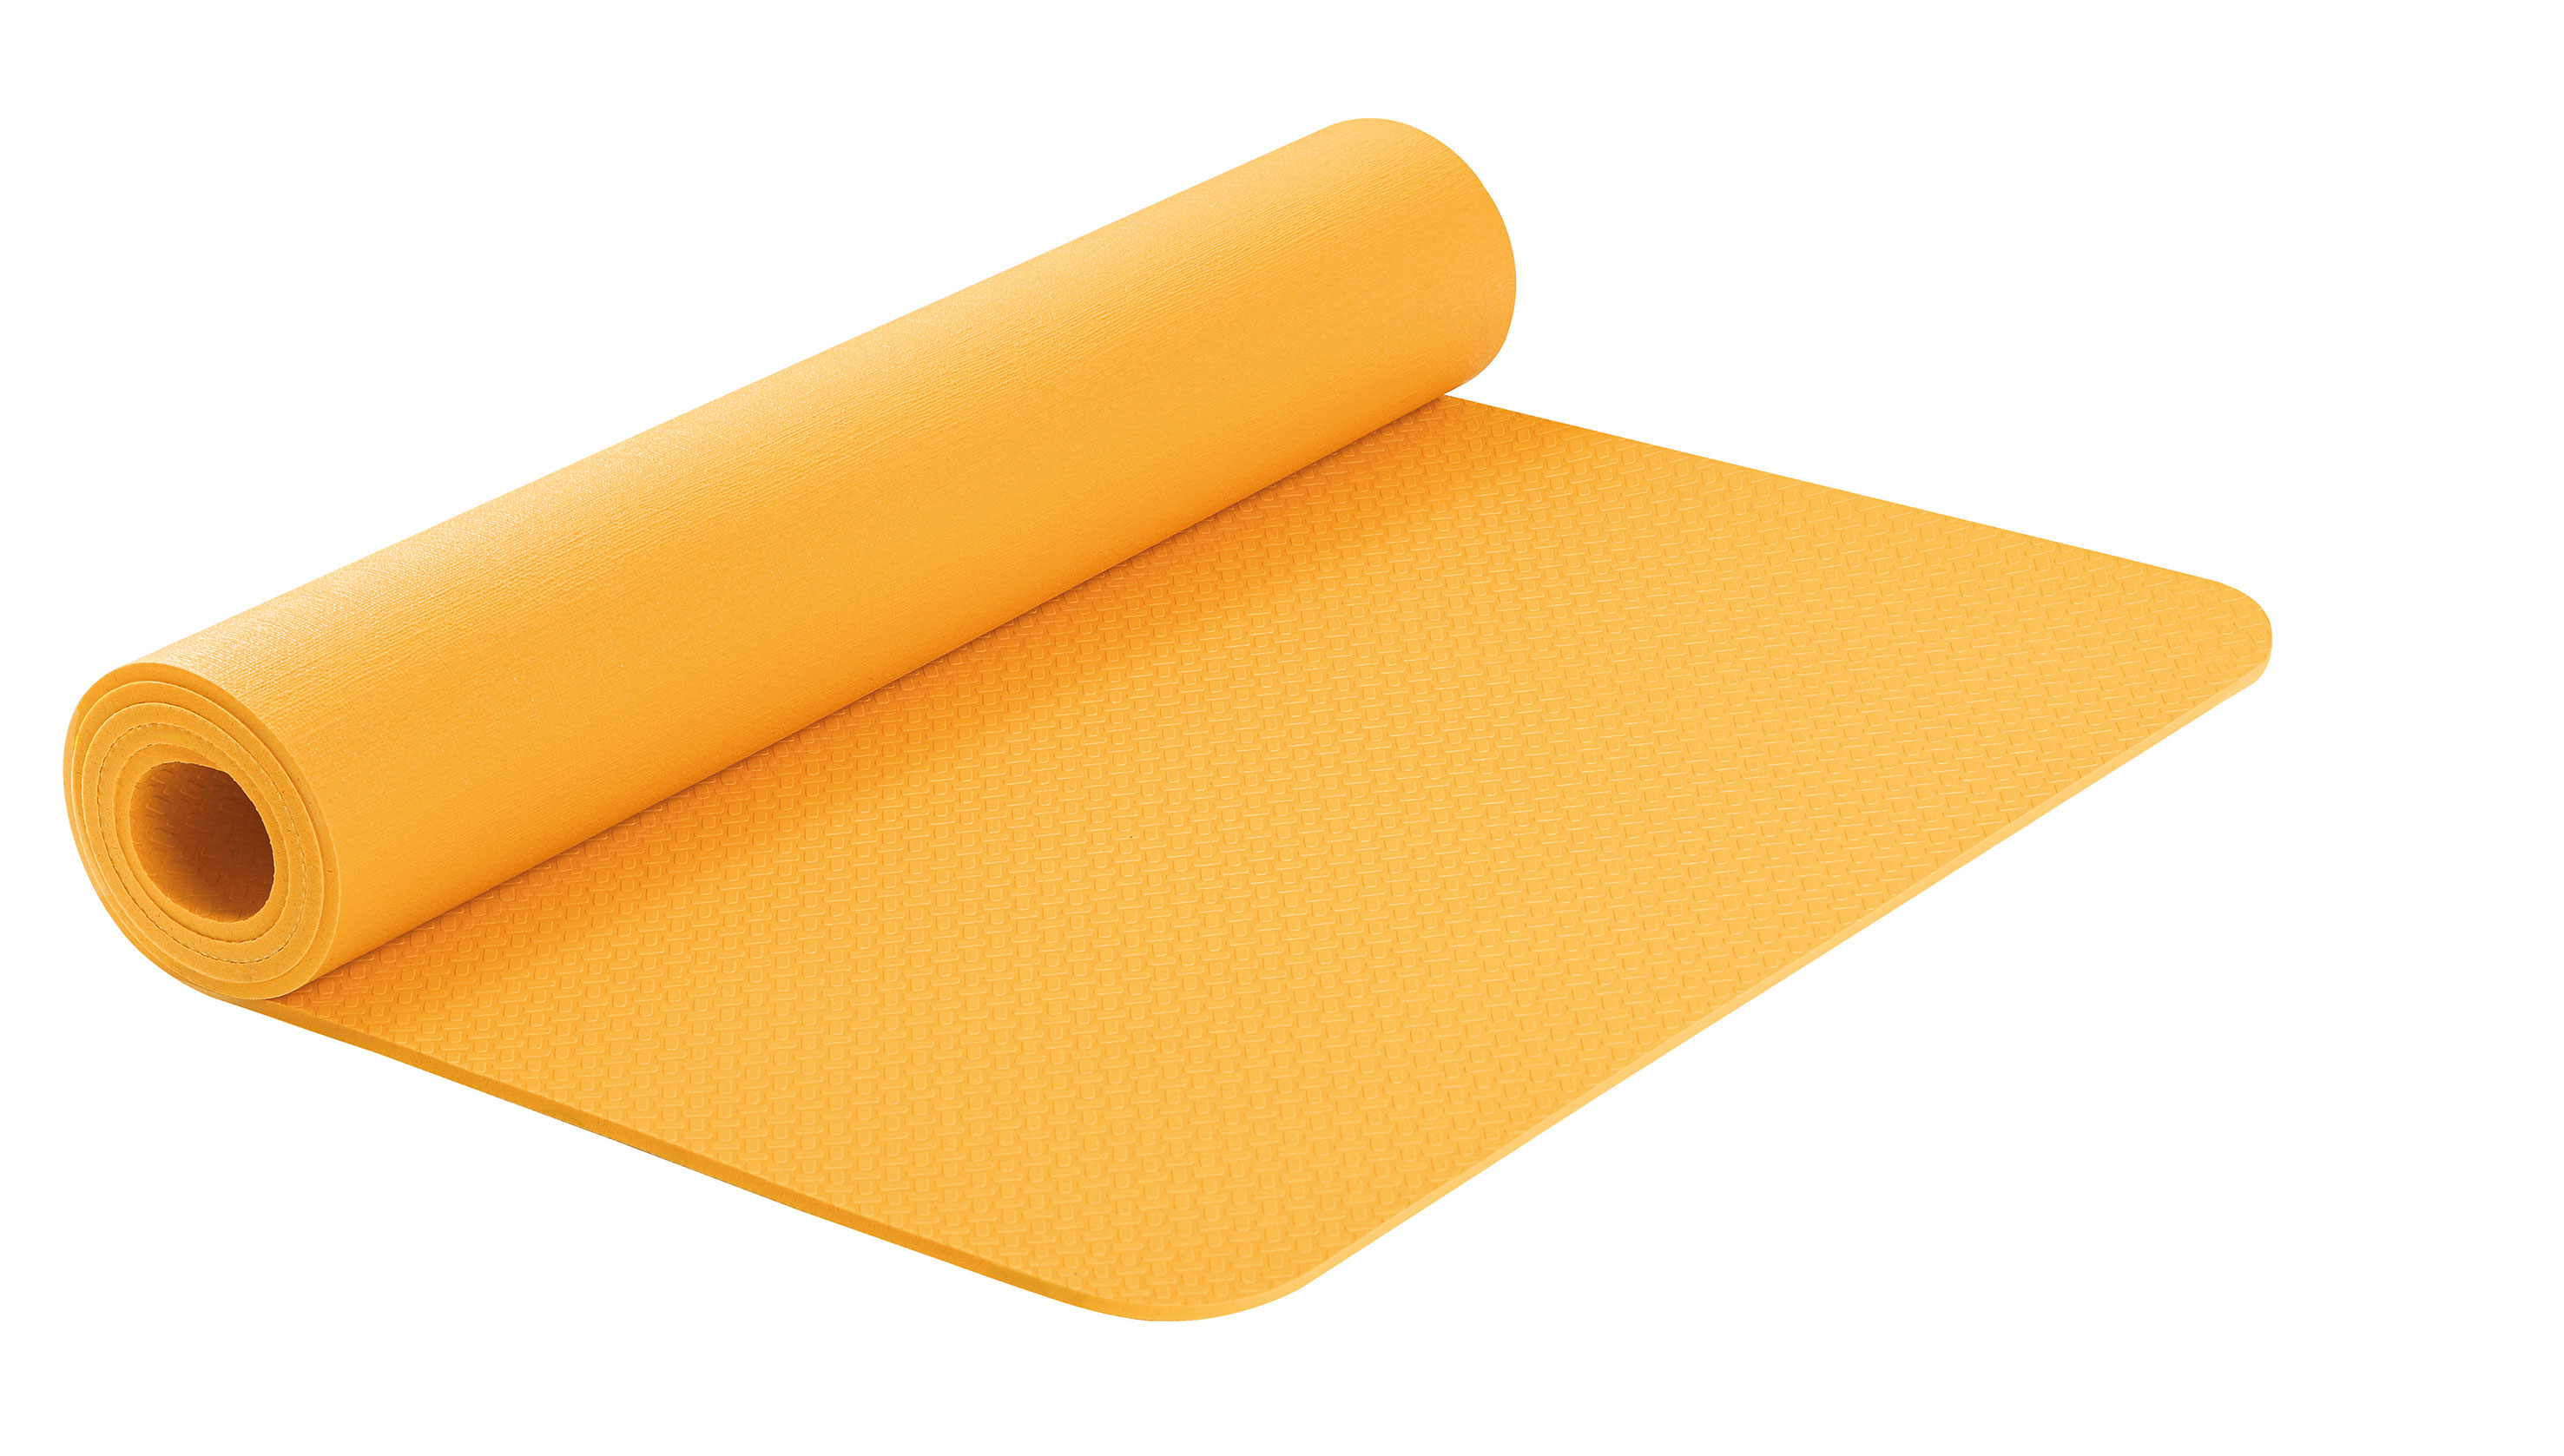 Yoga CALYANA Pro mat